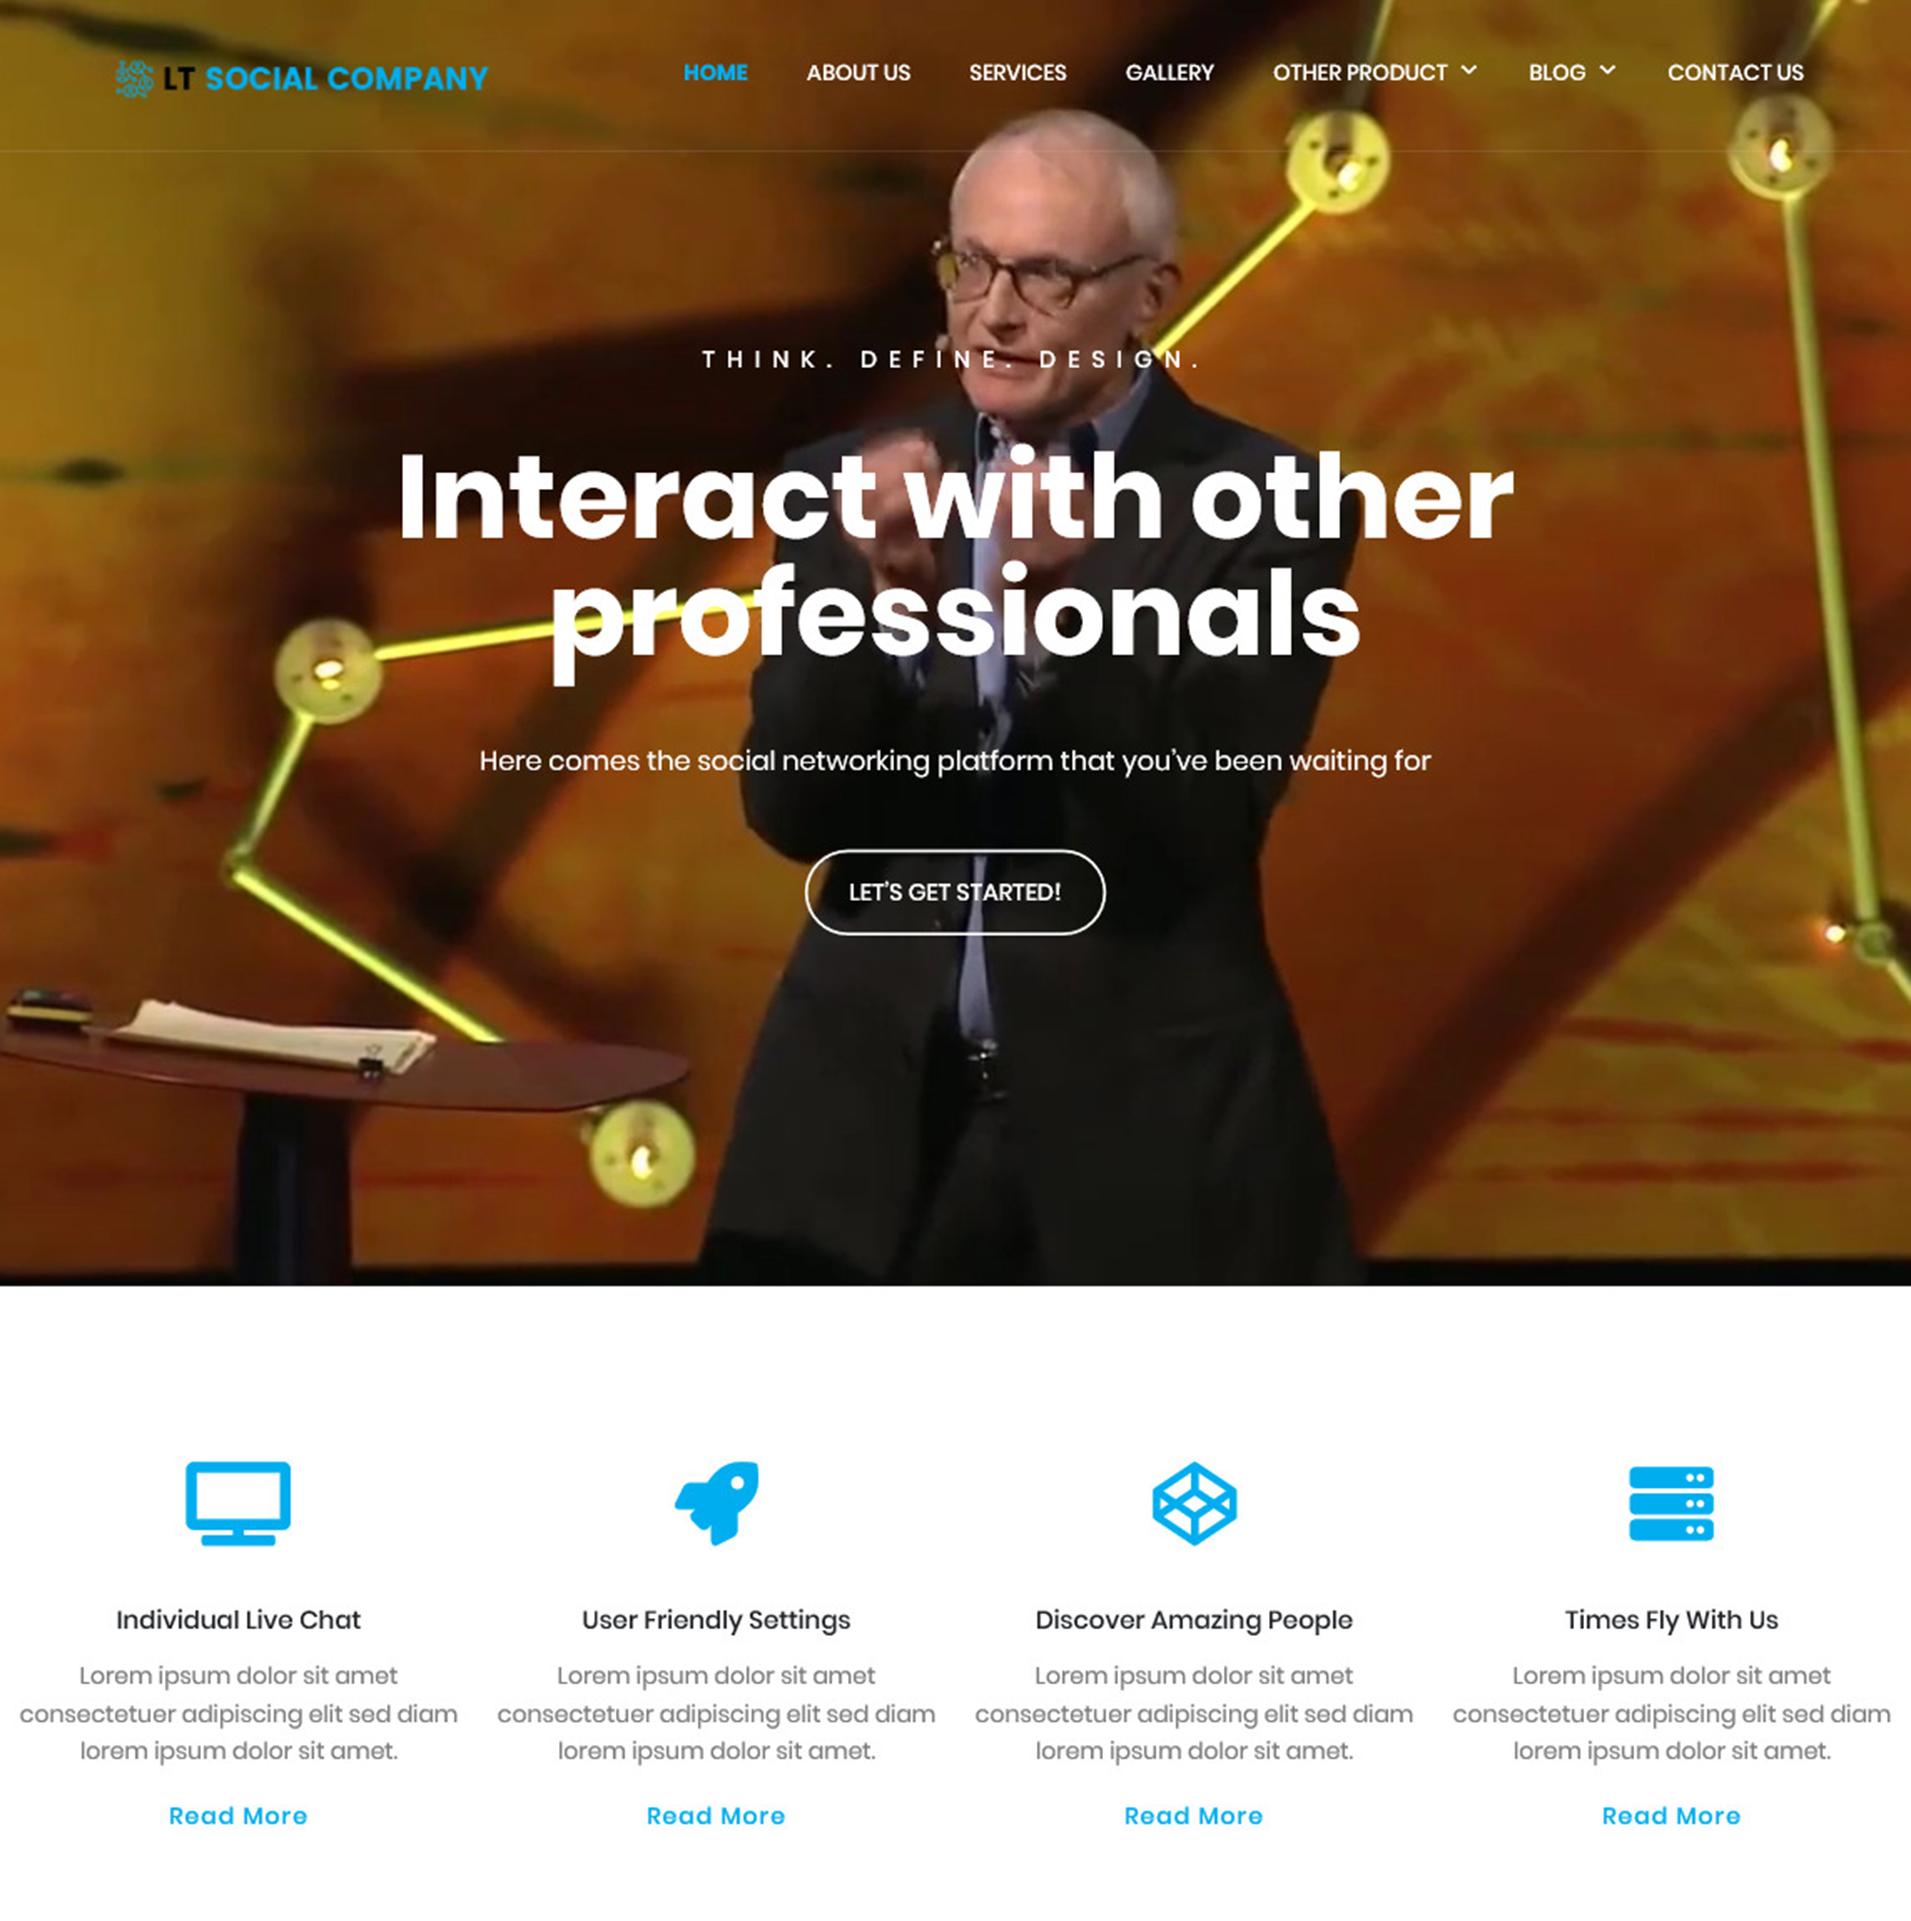 lt-social-company-free-responsive-wordpress-theme-full